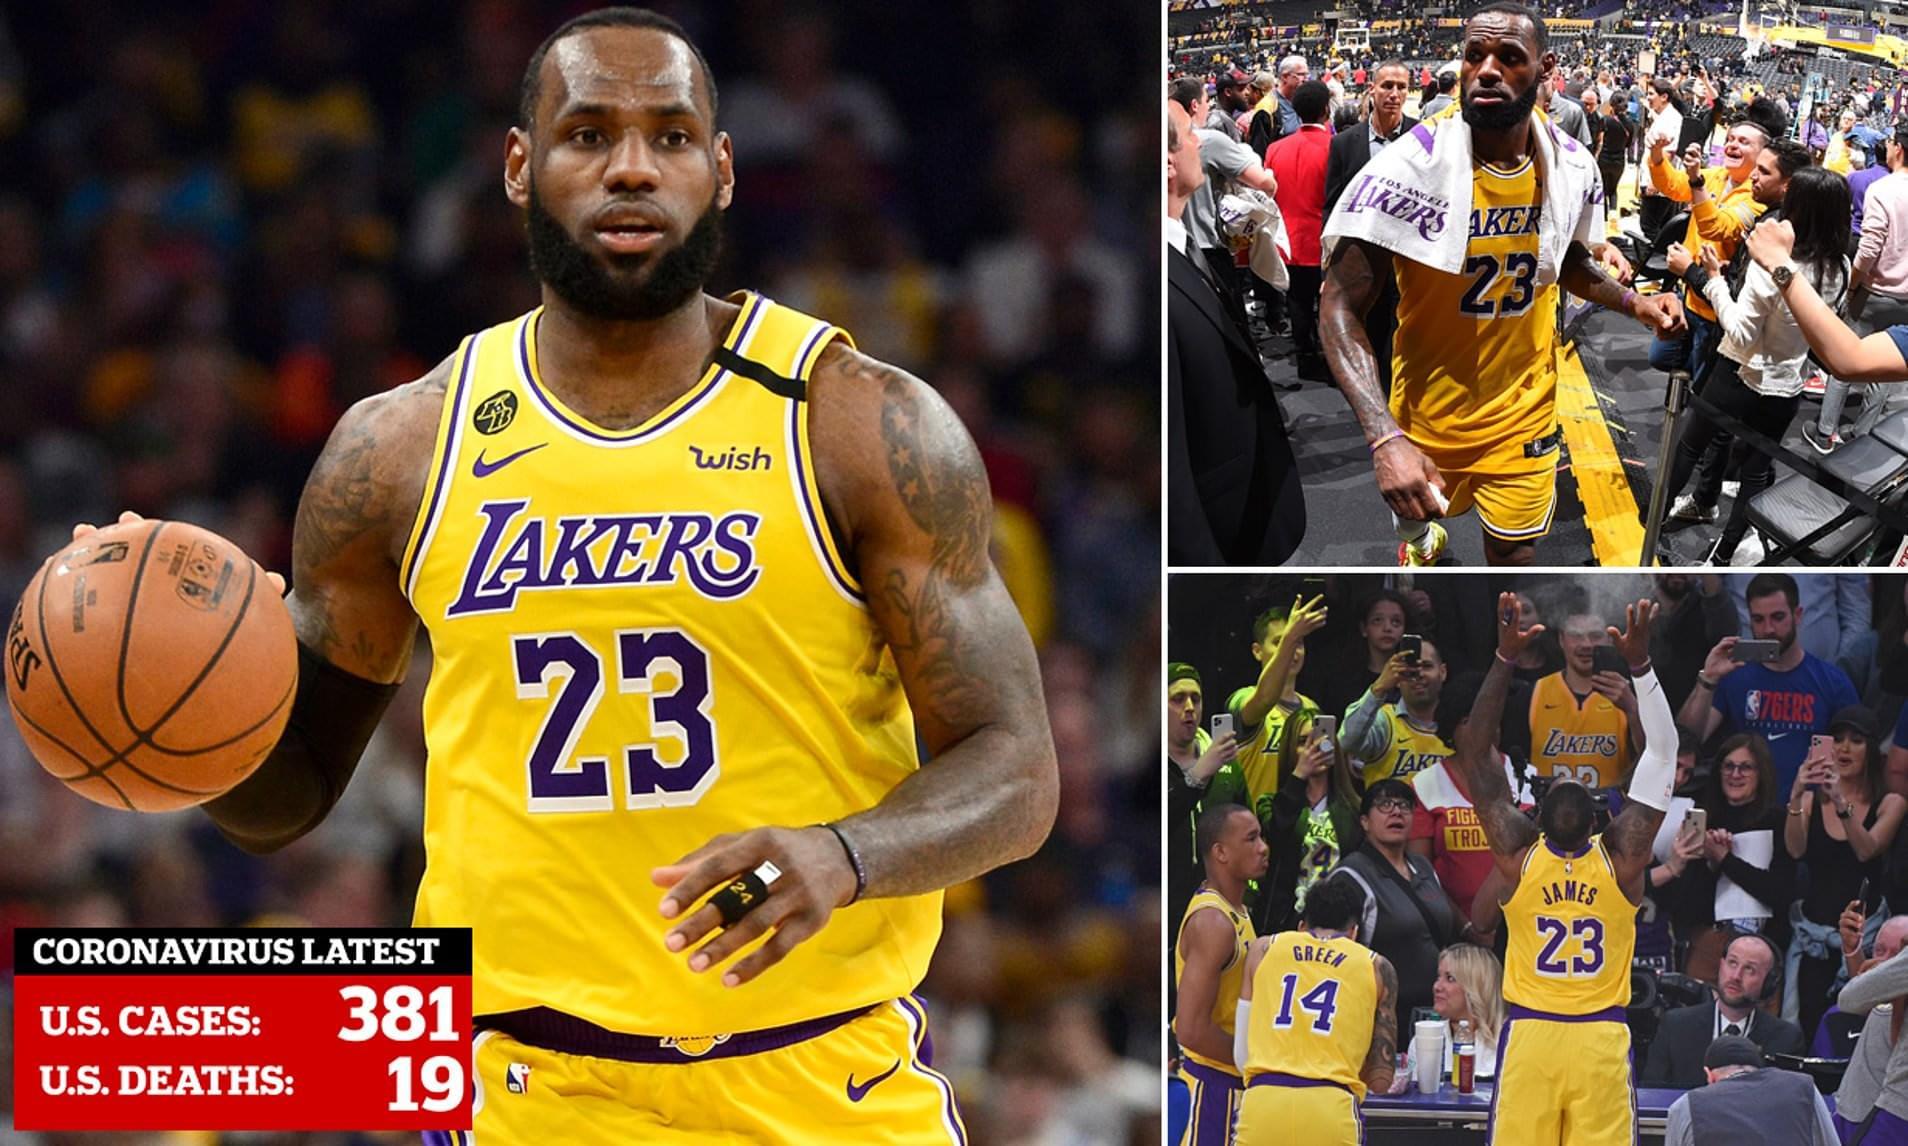 CORONAVIRUS: LeBron James Refuse to Play in Empty Gym